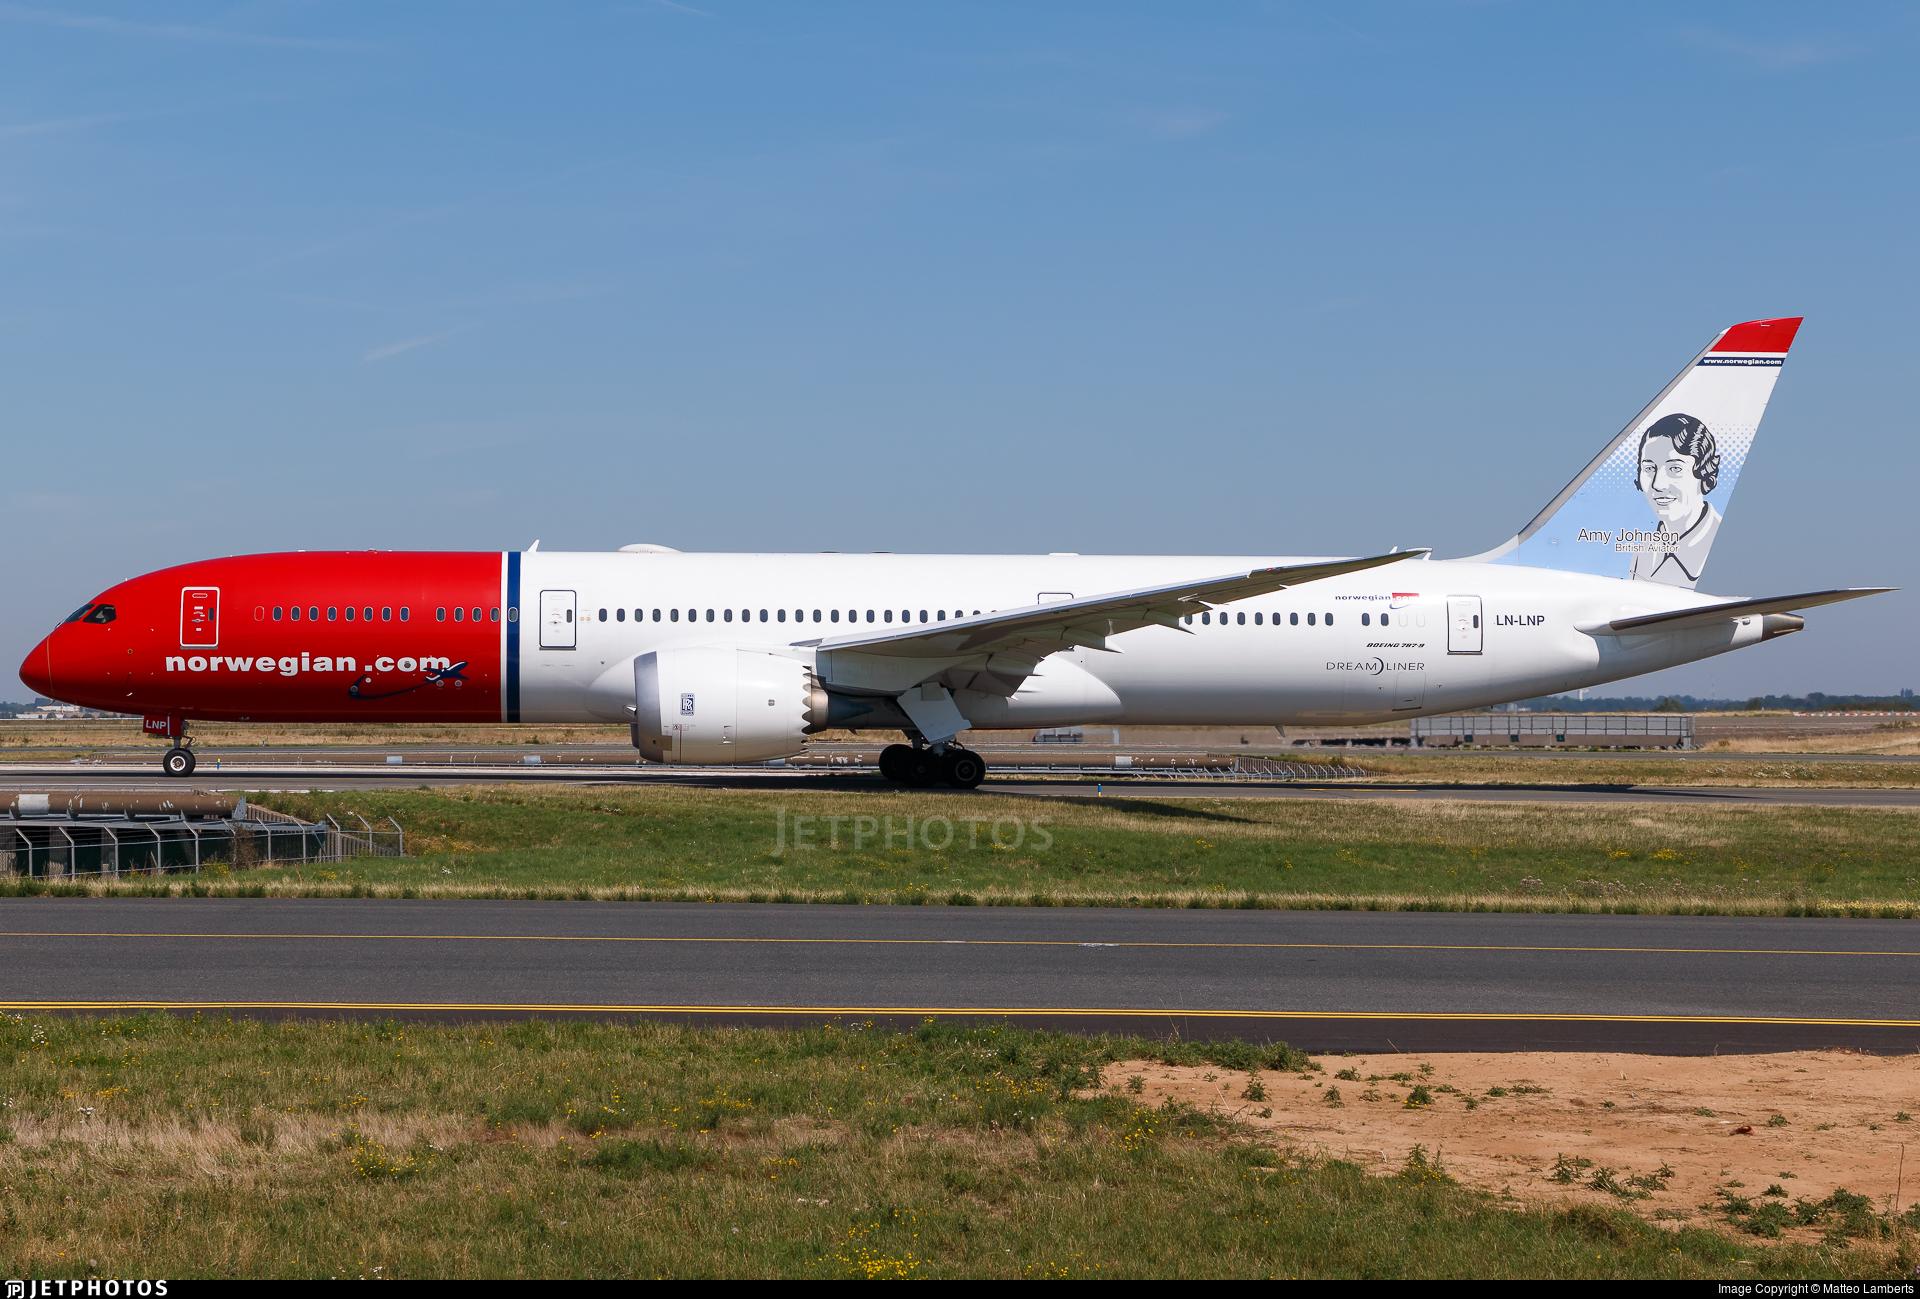 LN-LNP - Boeing 787-9 Dreamliner - Norwegian